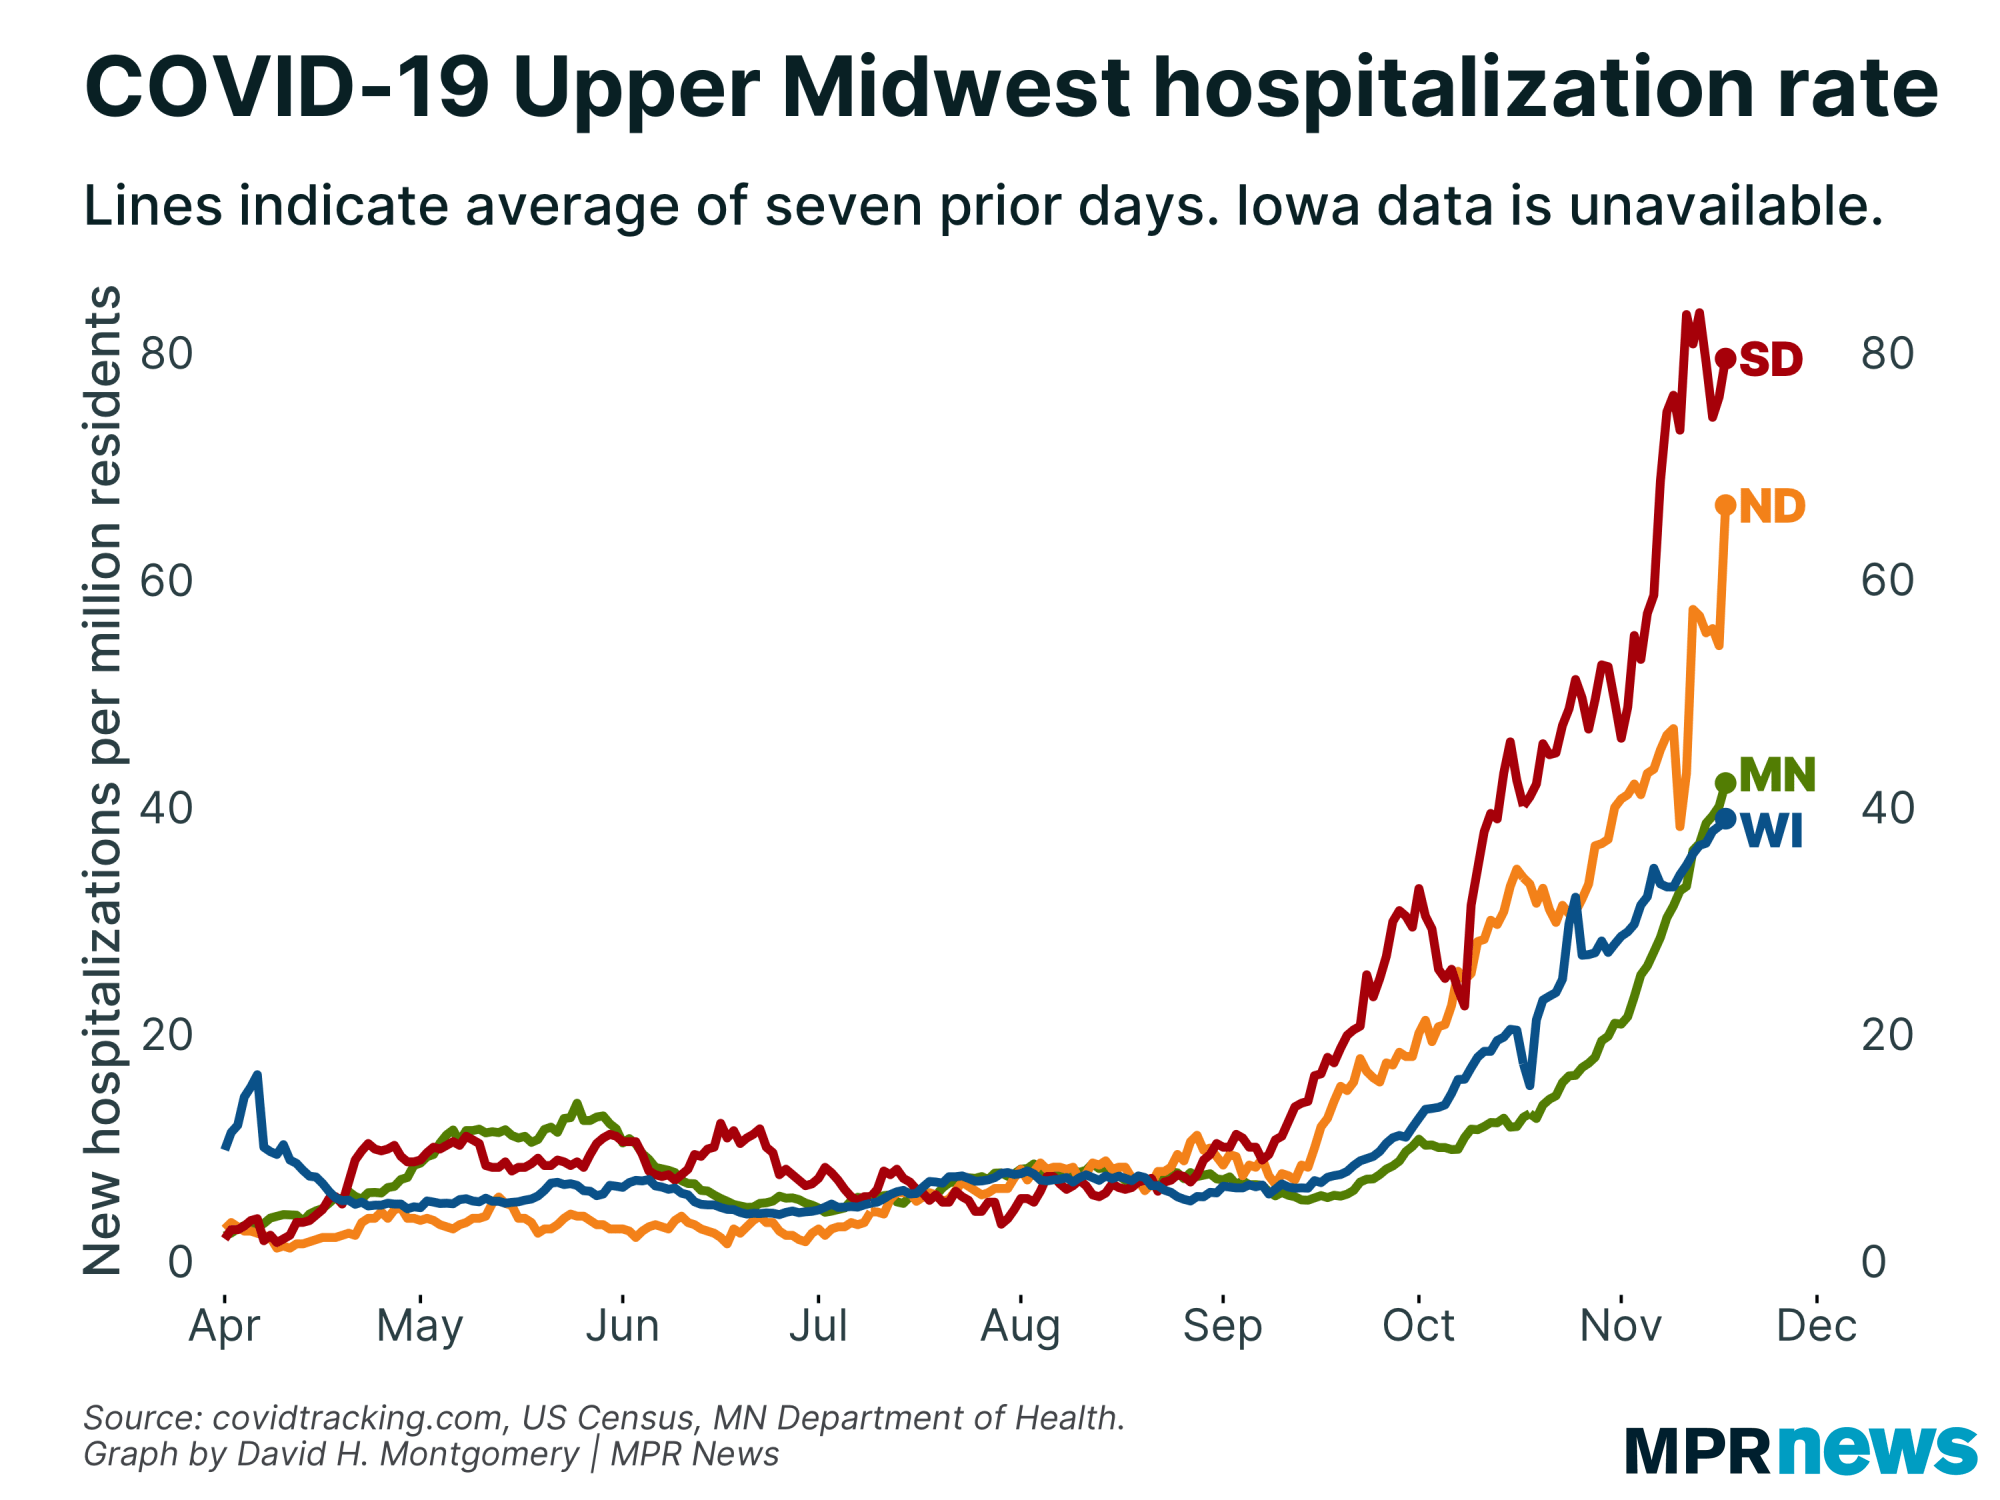 New COVID-19 hospitalizations per capita in the Upper Midwest